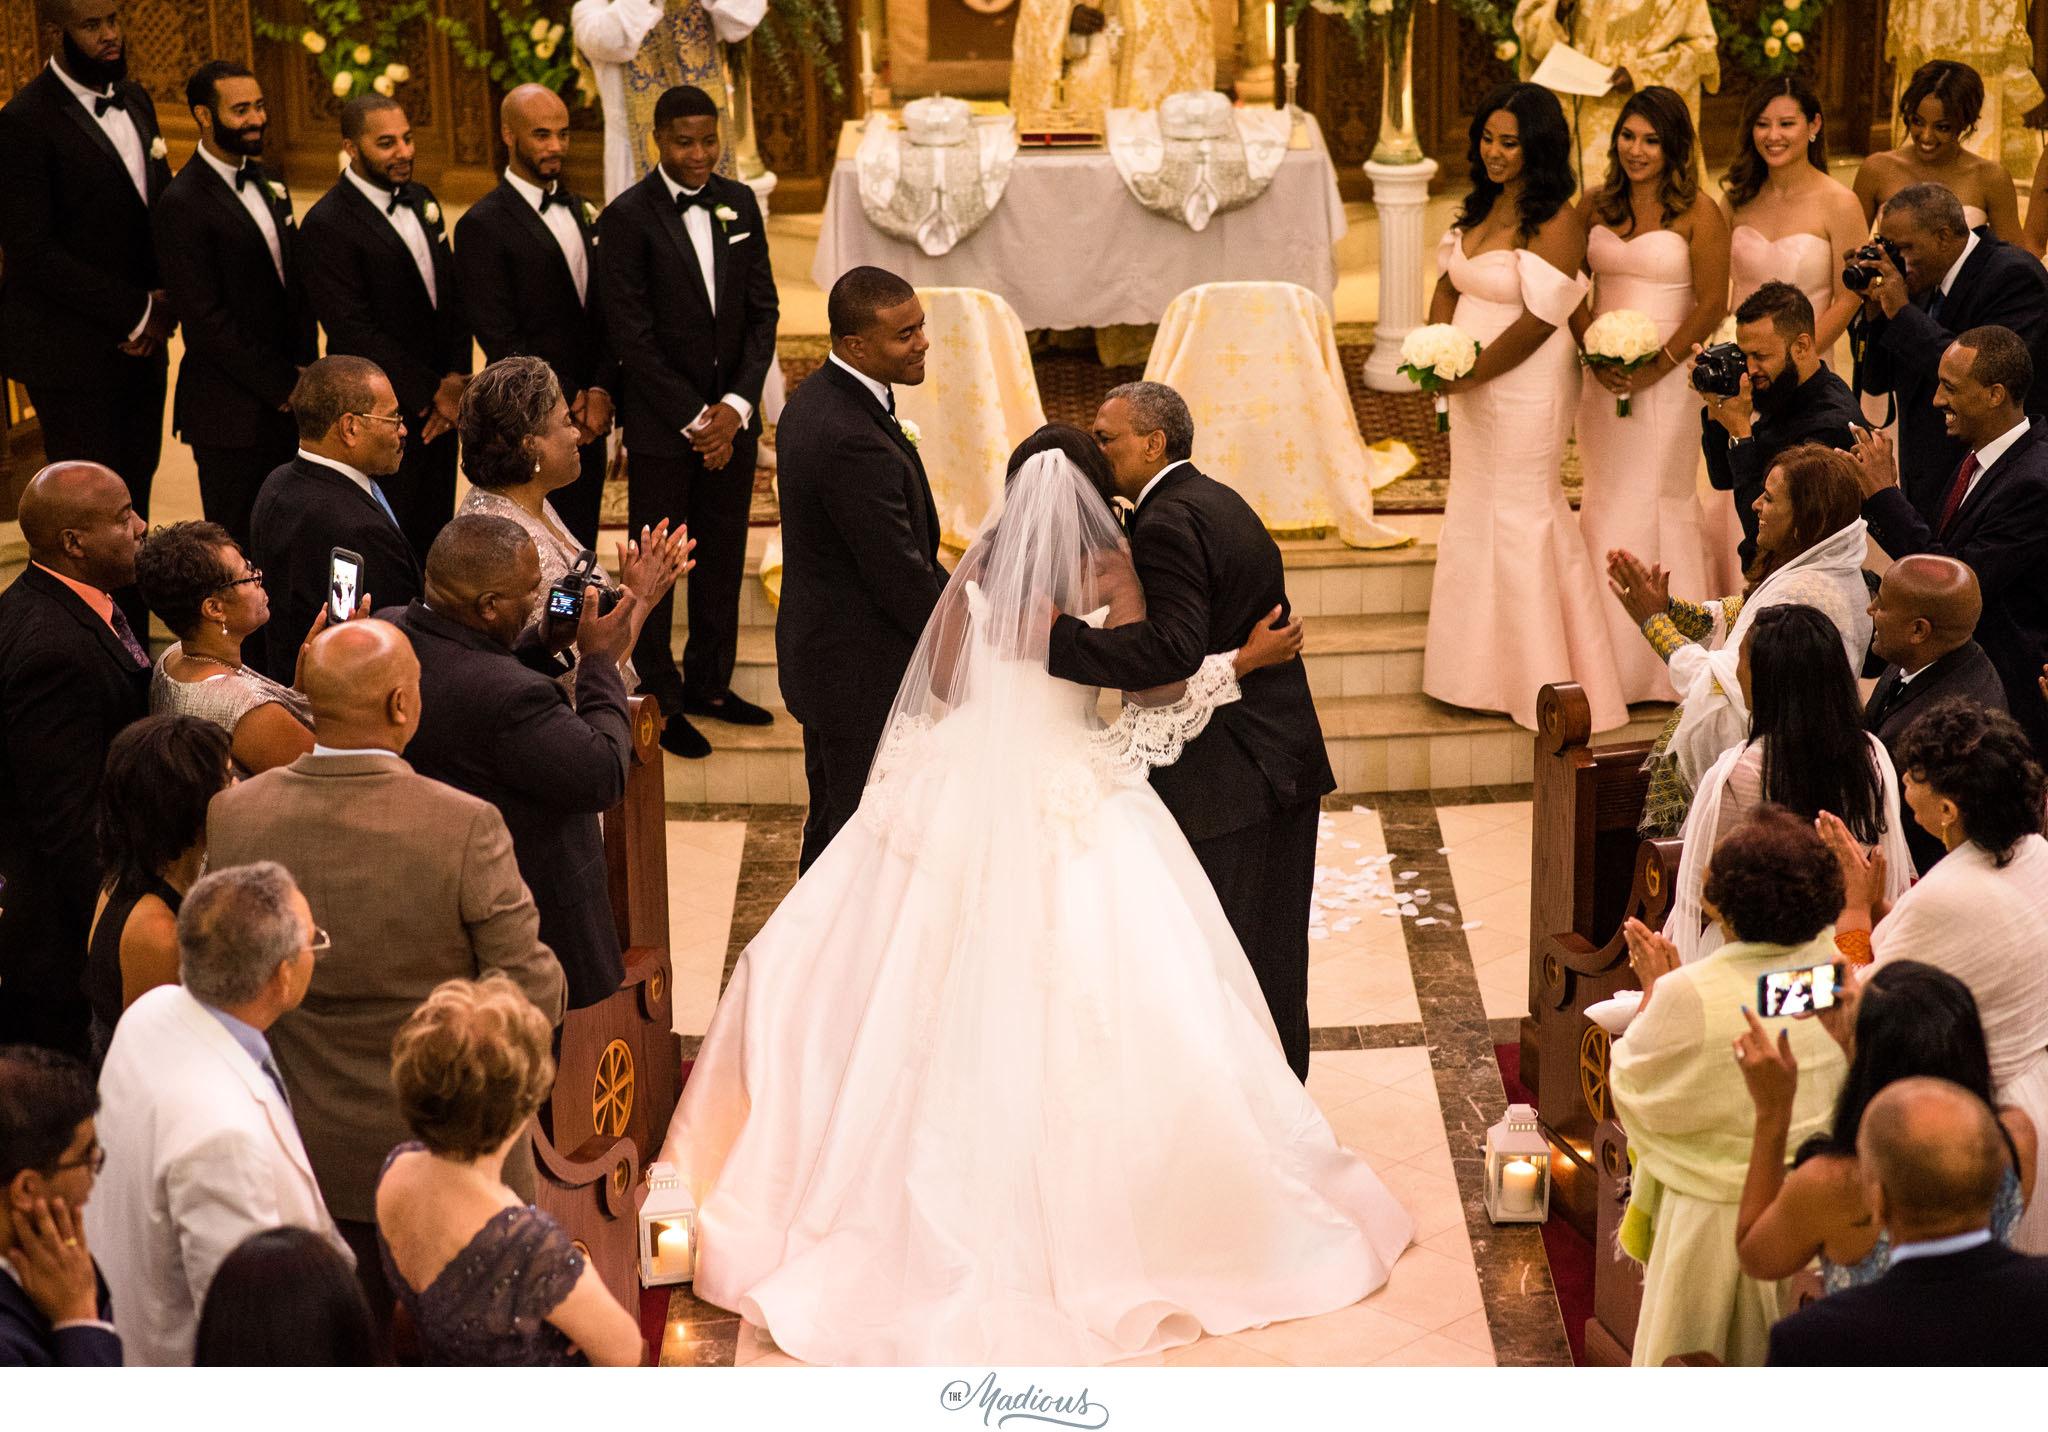 nmwa+wedding,+women+in+the+arts+wedding,+ethiopian+wedding,+dc+wedding+0076.jpg